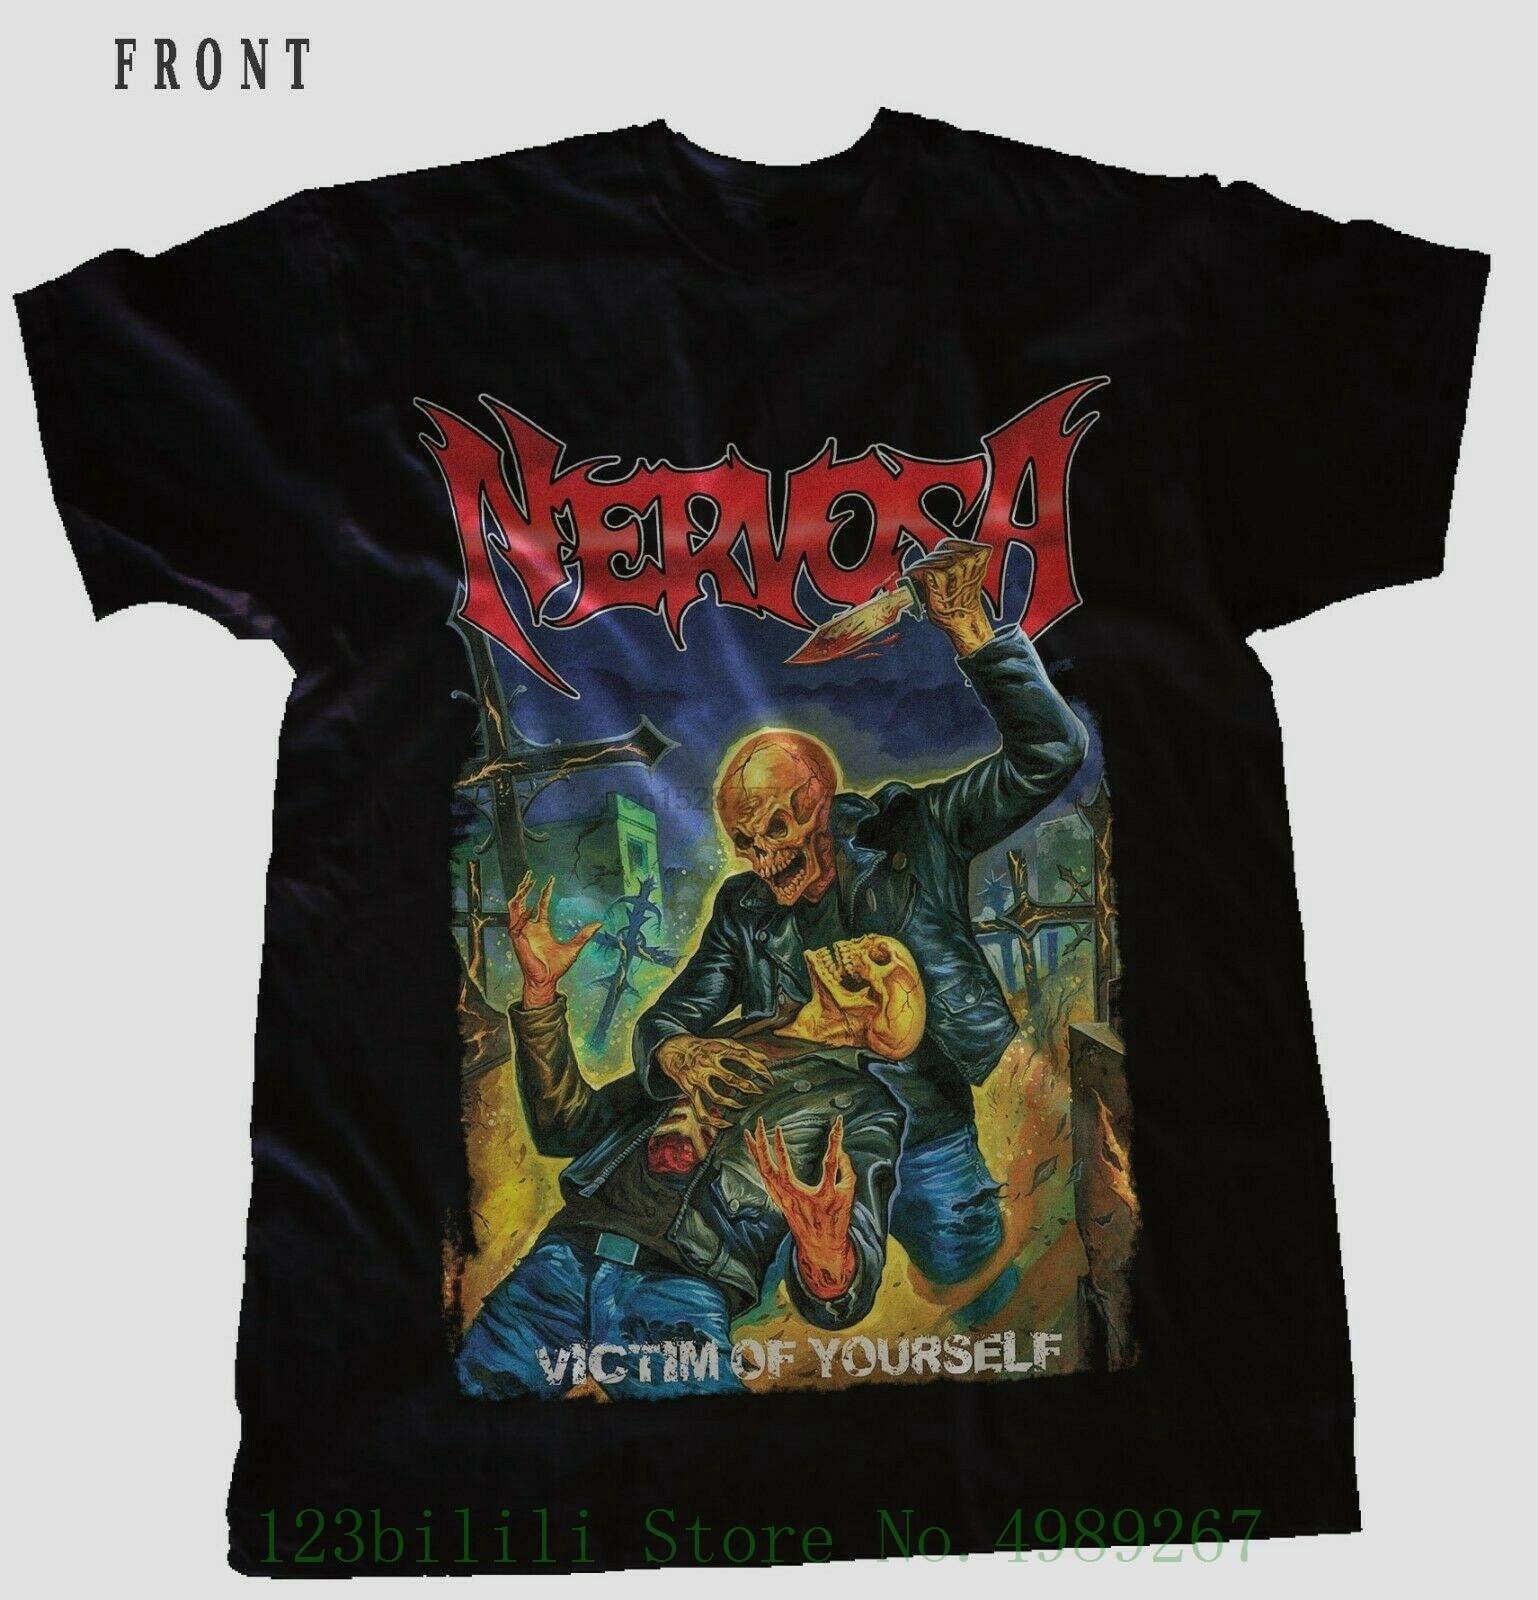 Nervosa-vítima de si mesmo-thrash metal bnad preto t _ camisa tamanhos S-3Xl masculino topos legal o pescoço camiseta